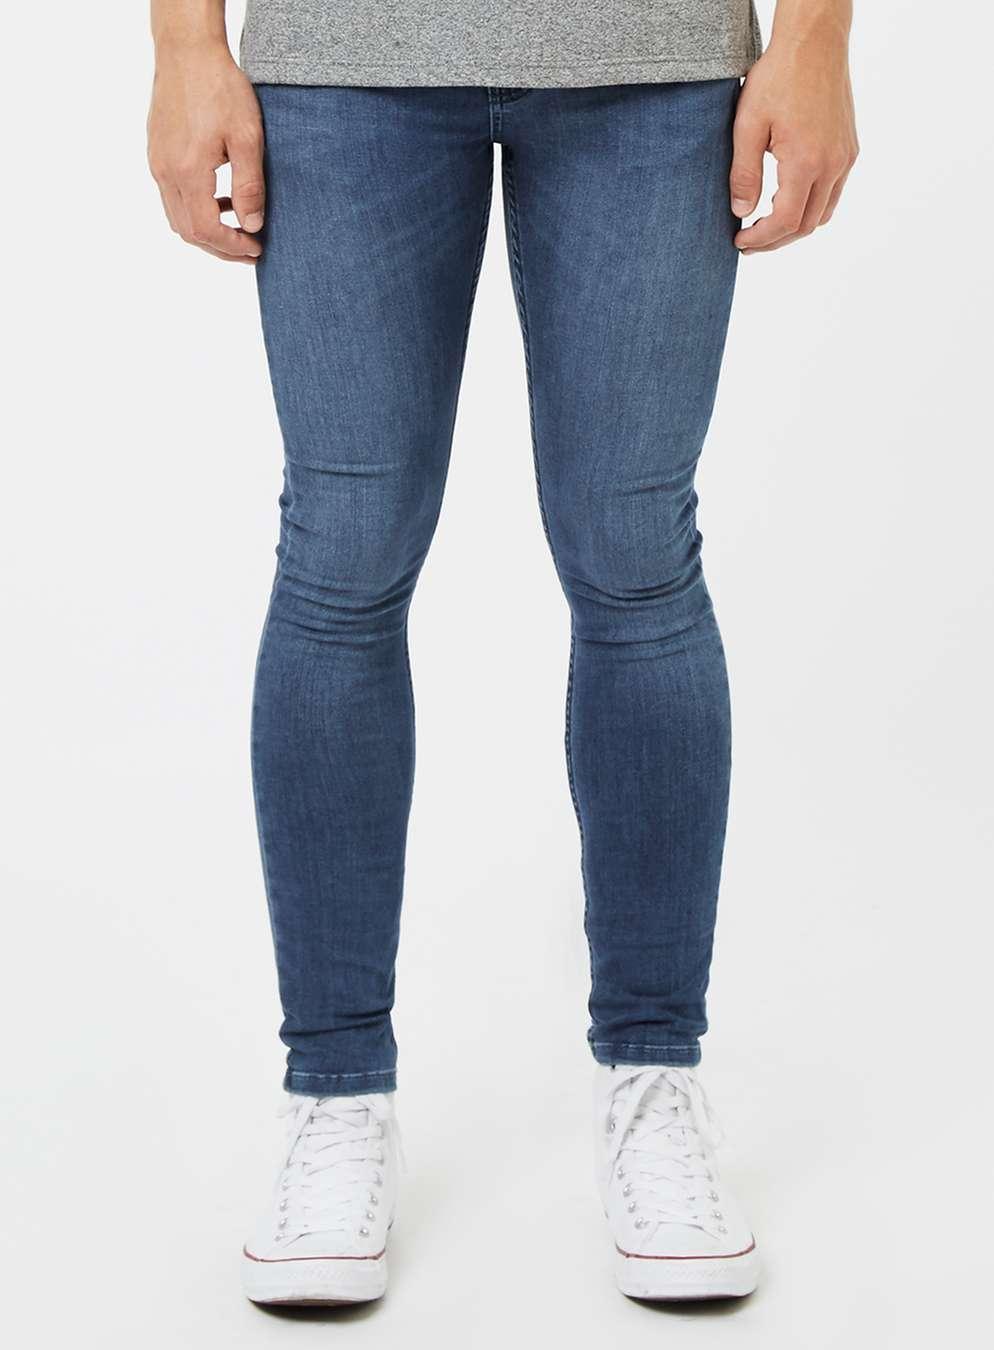 topman-super-spray-on-skinny-jeans-blue